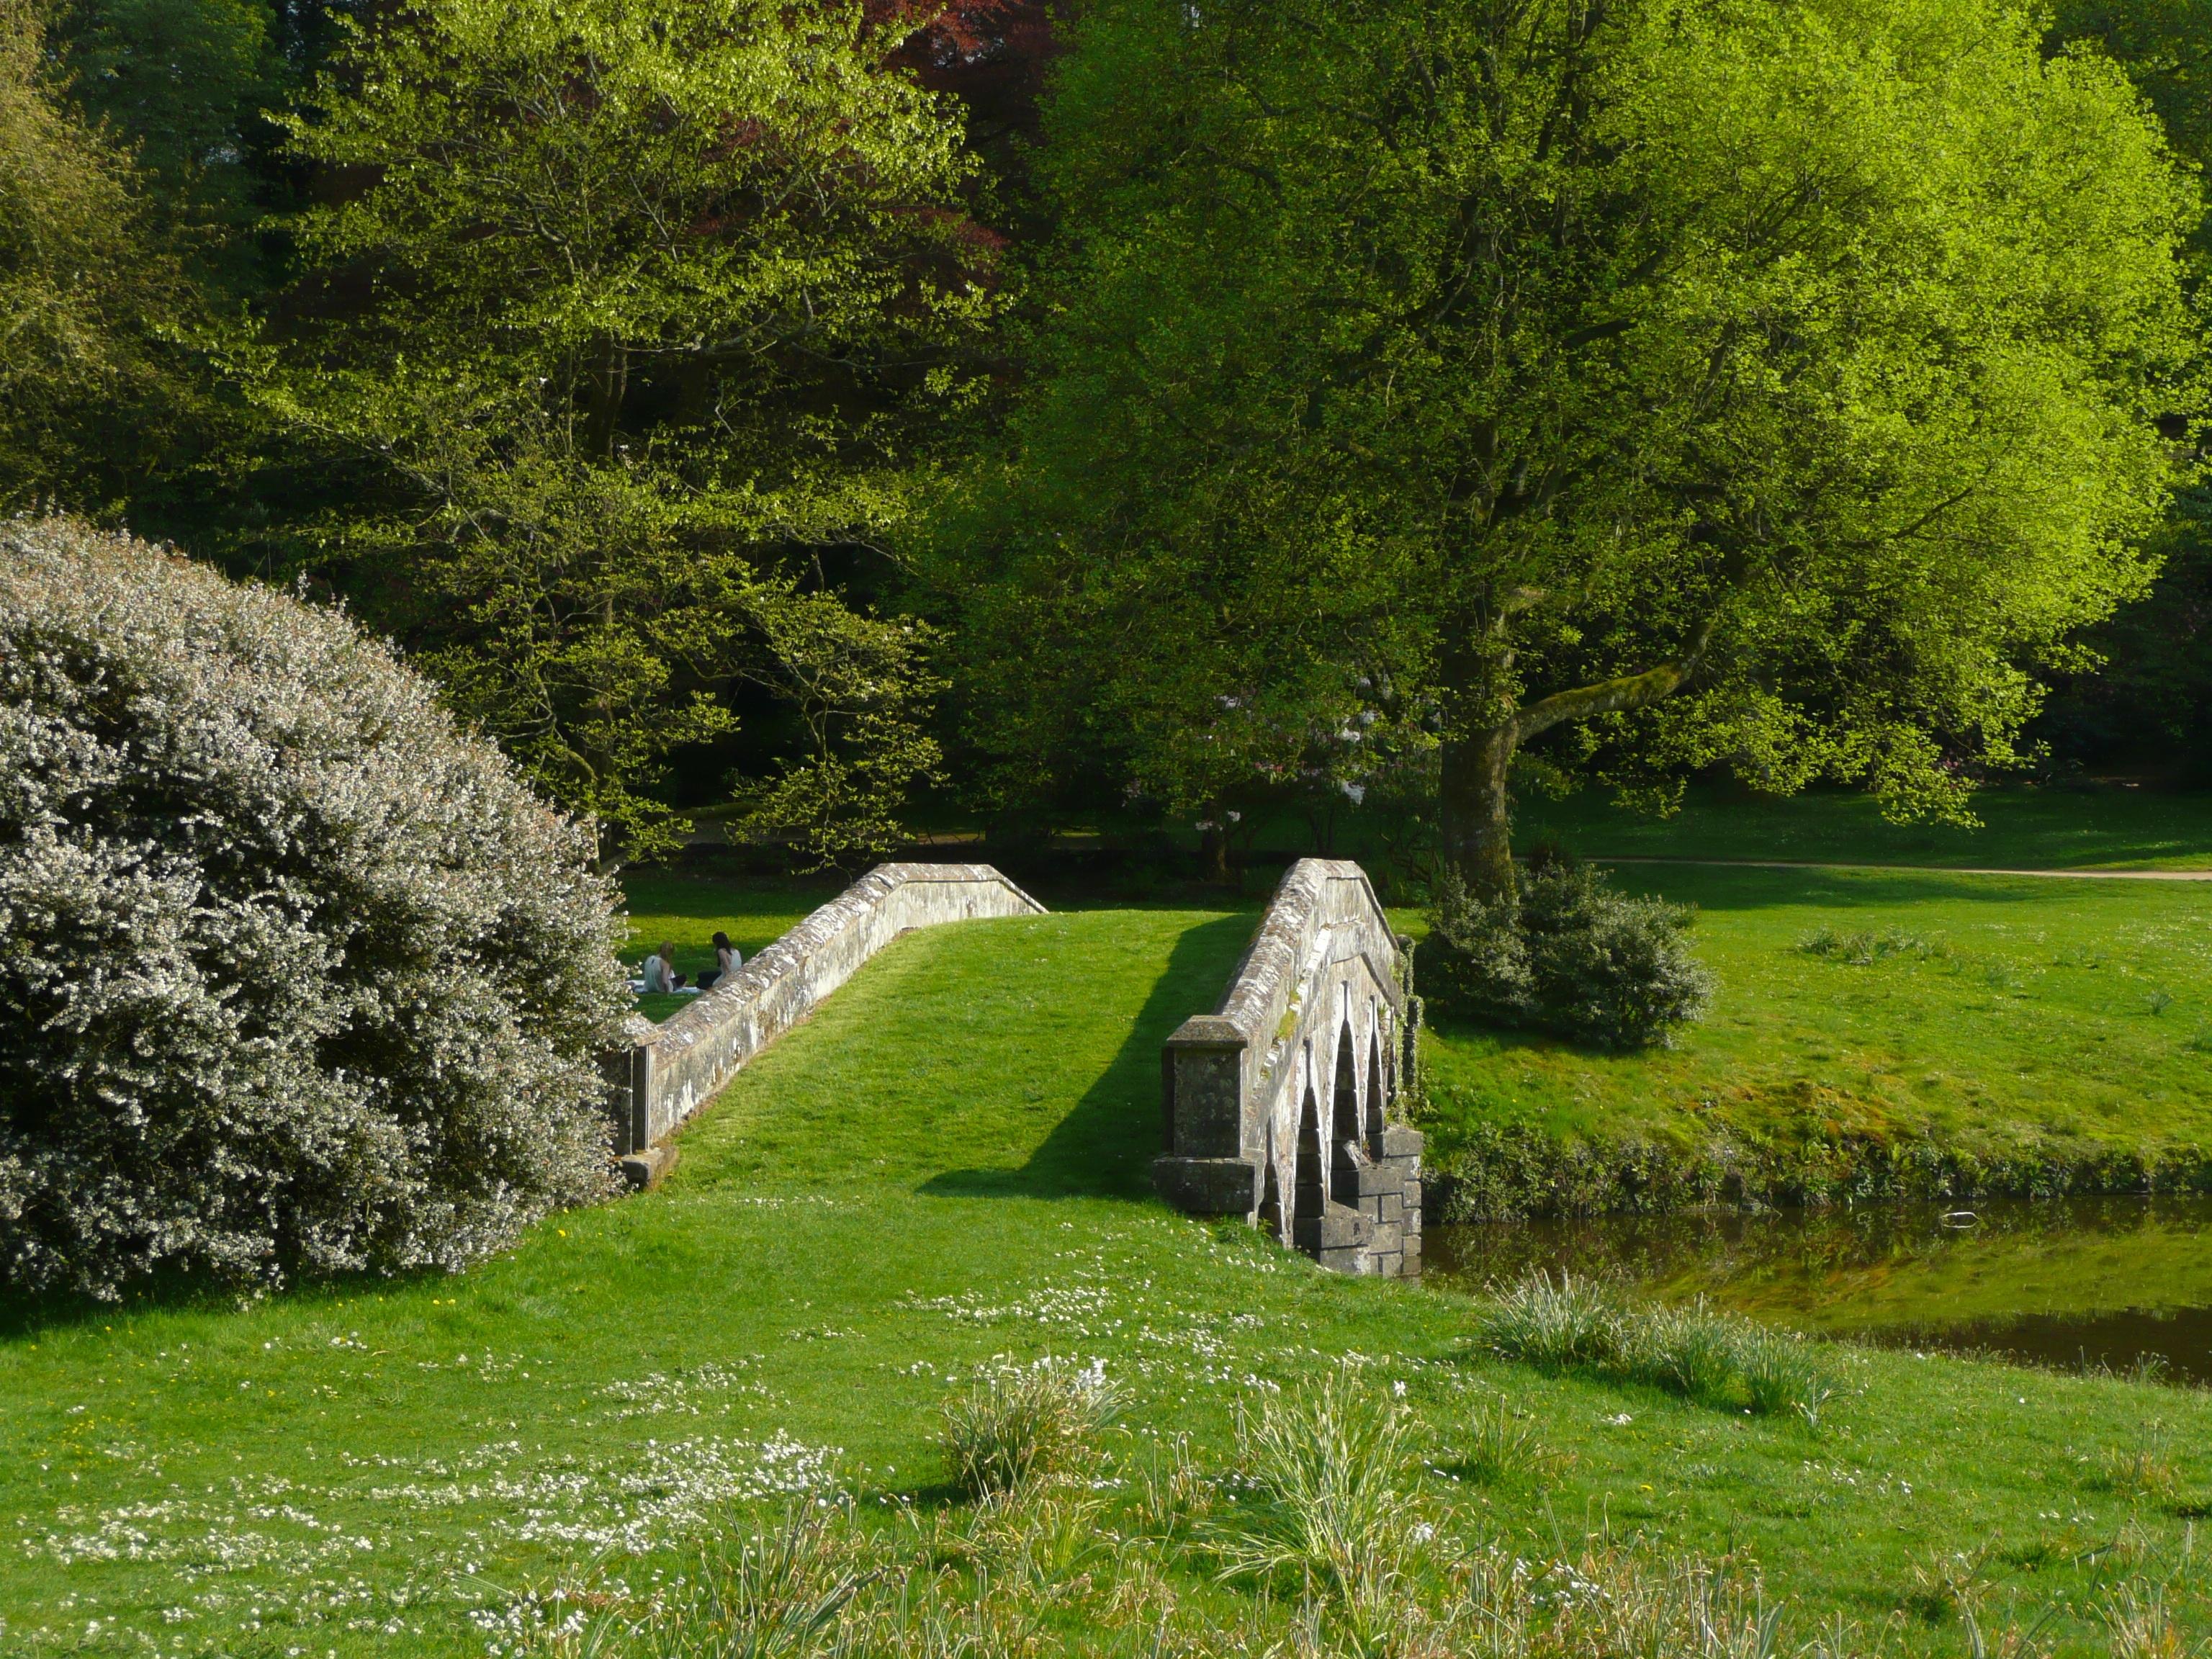 free images tree grass bridge lawn meadow flower green